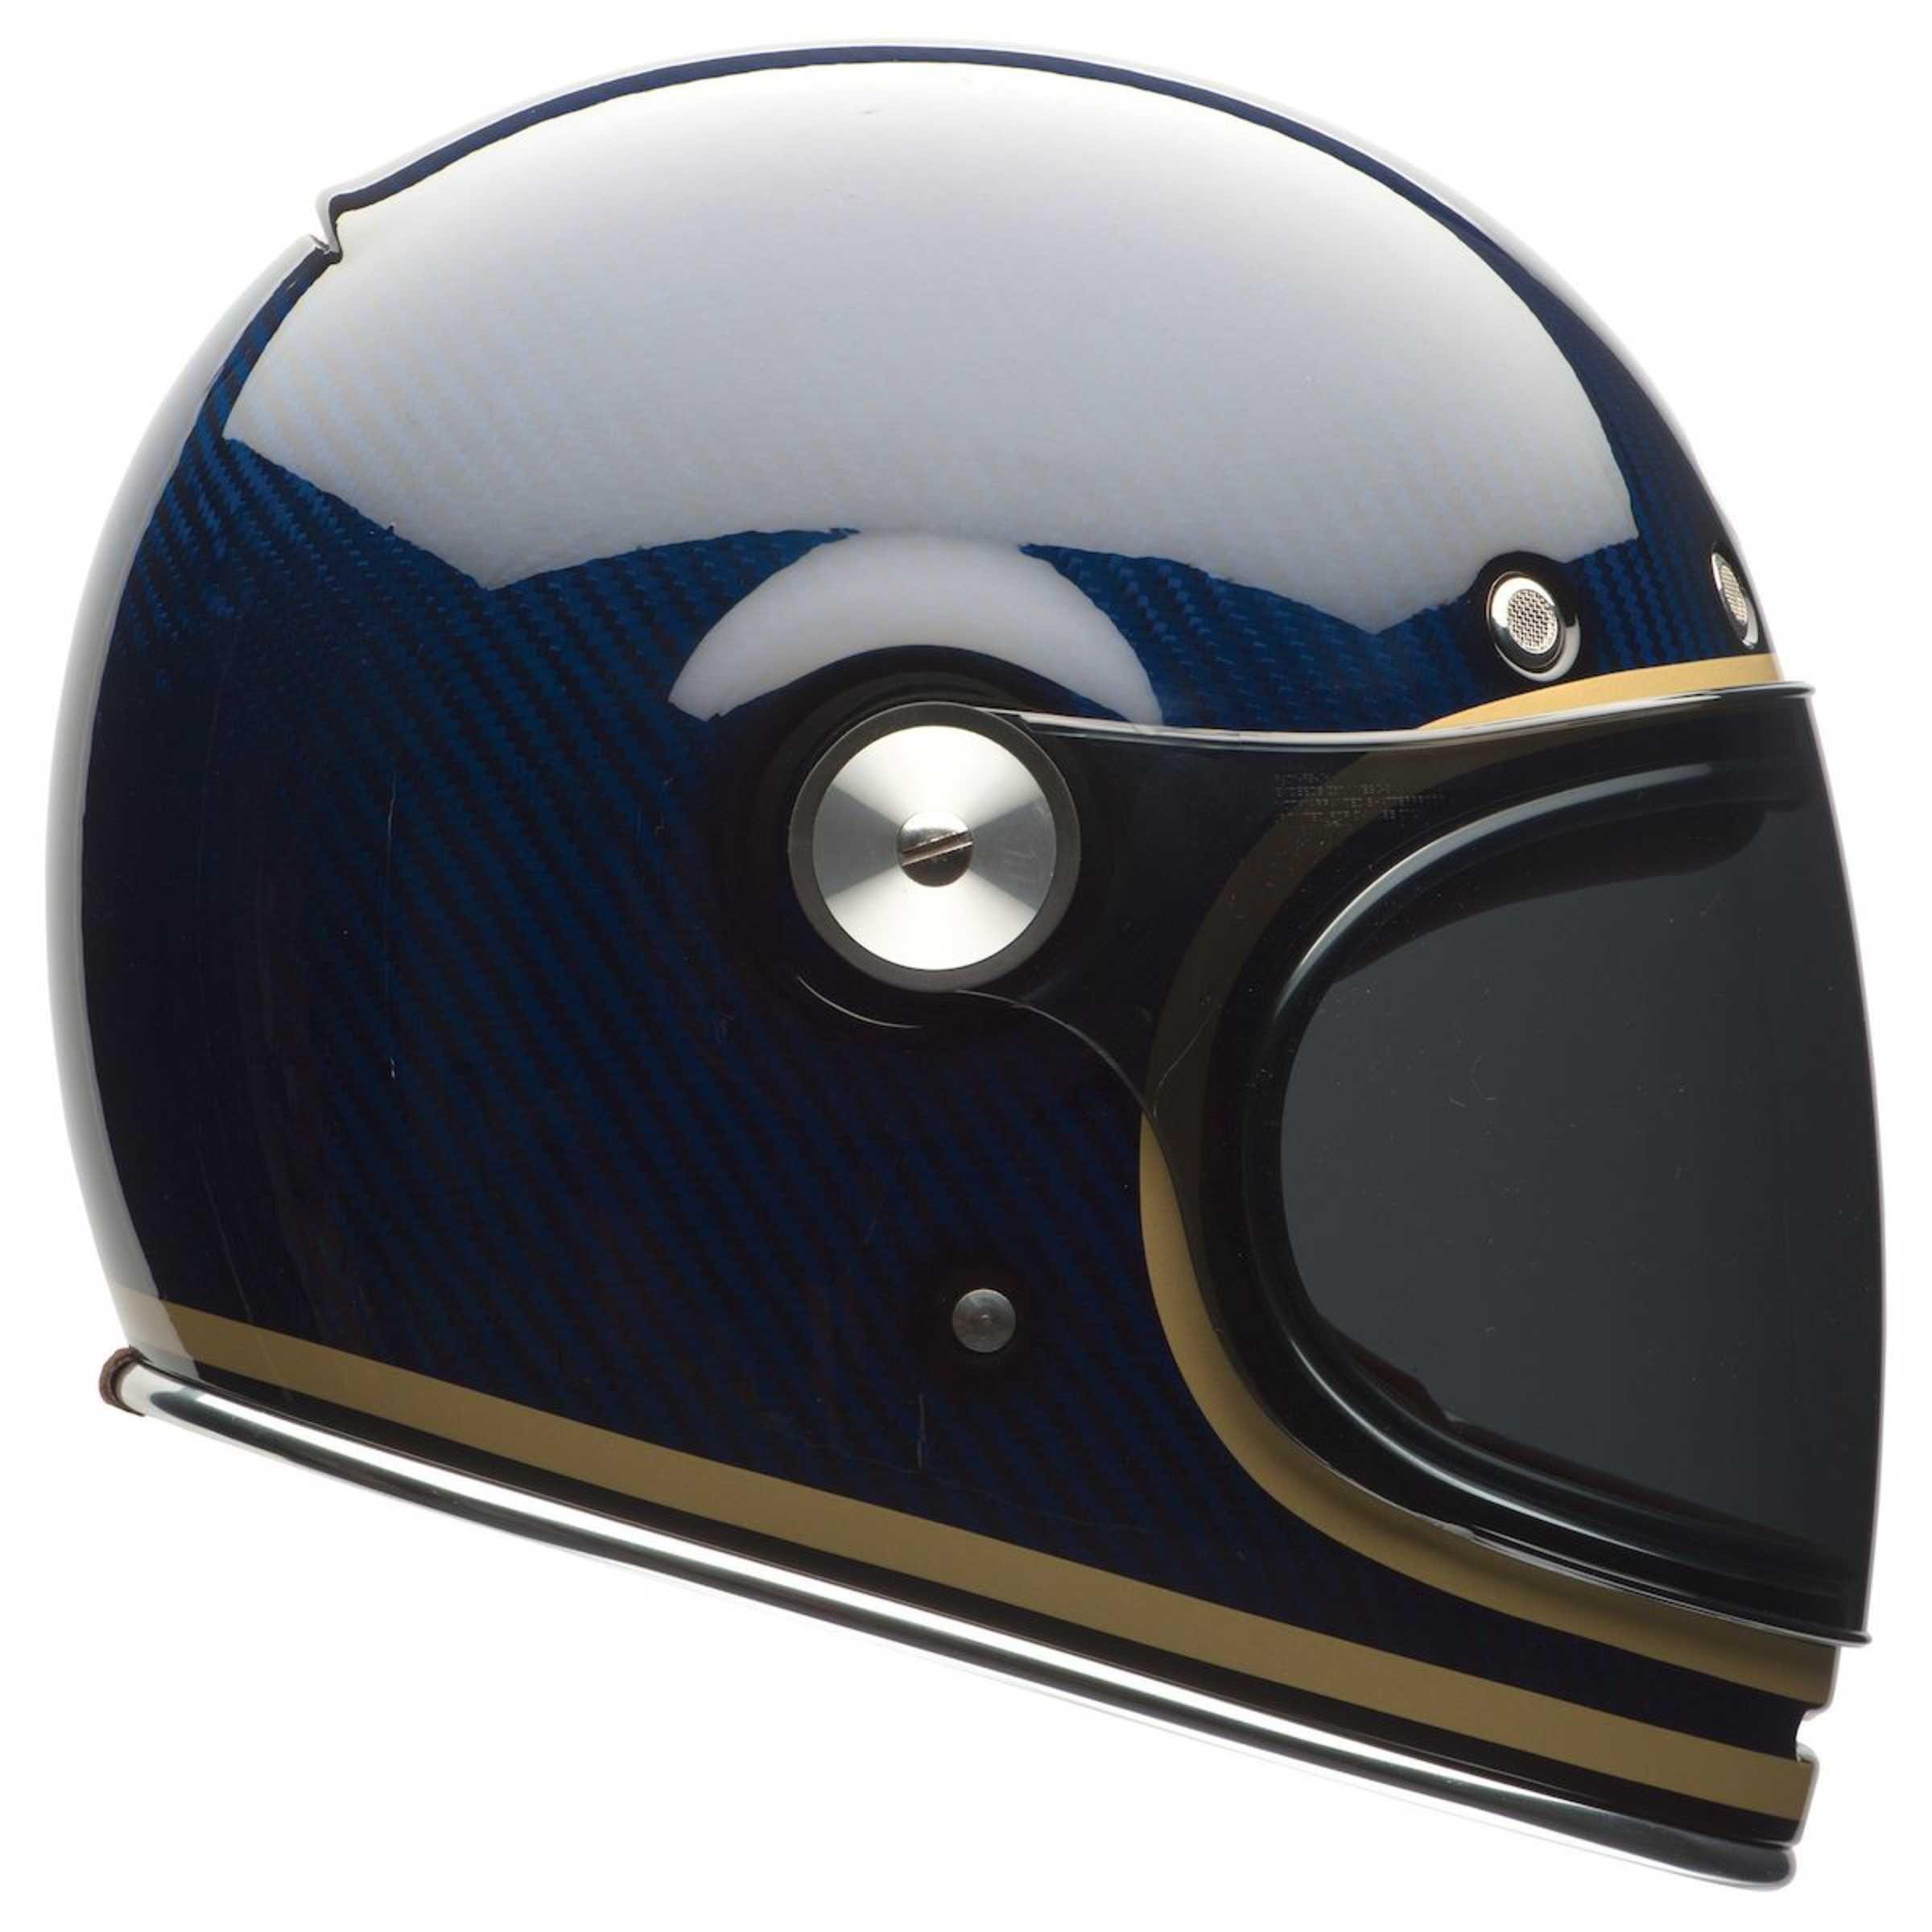 Bell S Vintage Inspired Bullitt Gets A Slick New Update In Blue Carbon Fiber Cool Motorcycle Helmets Motorcycle Helmets Blue Motorcycle Helmets